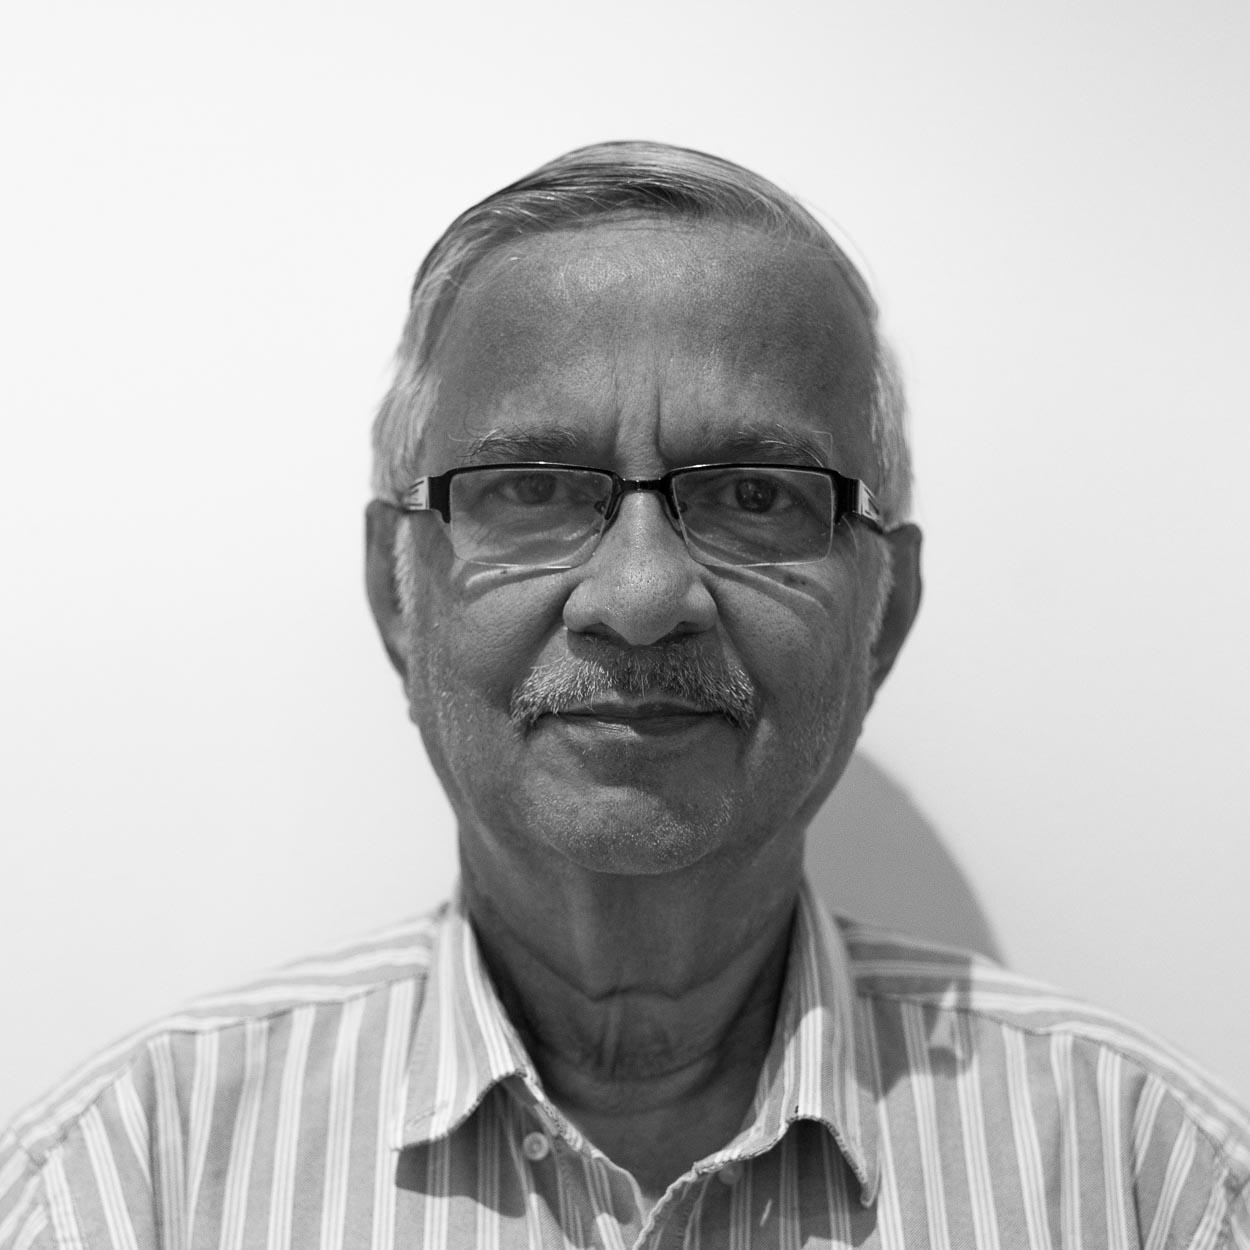 Kadathur B. Ramachandran